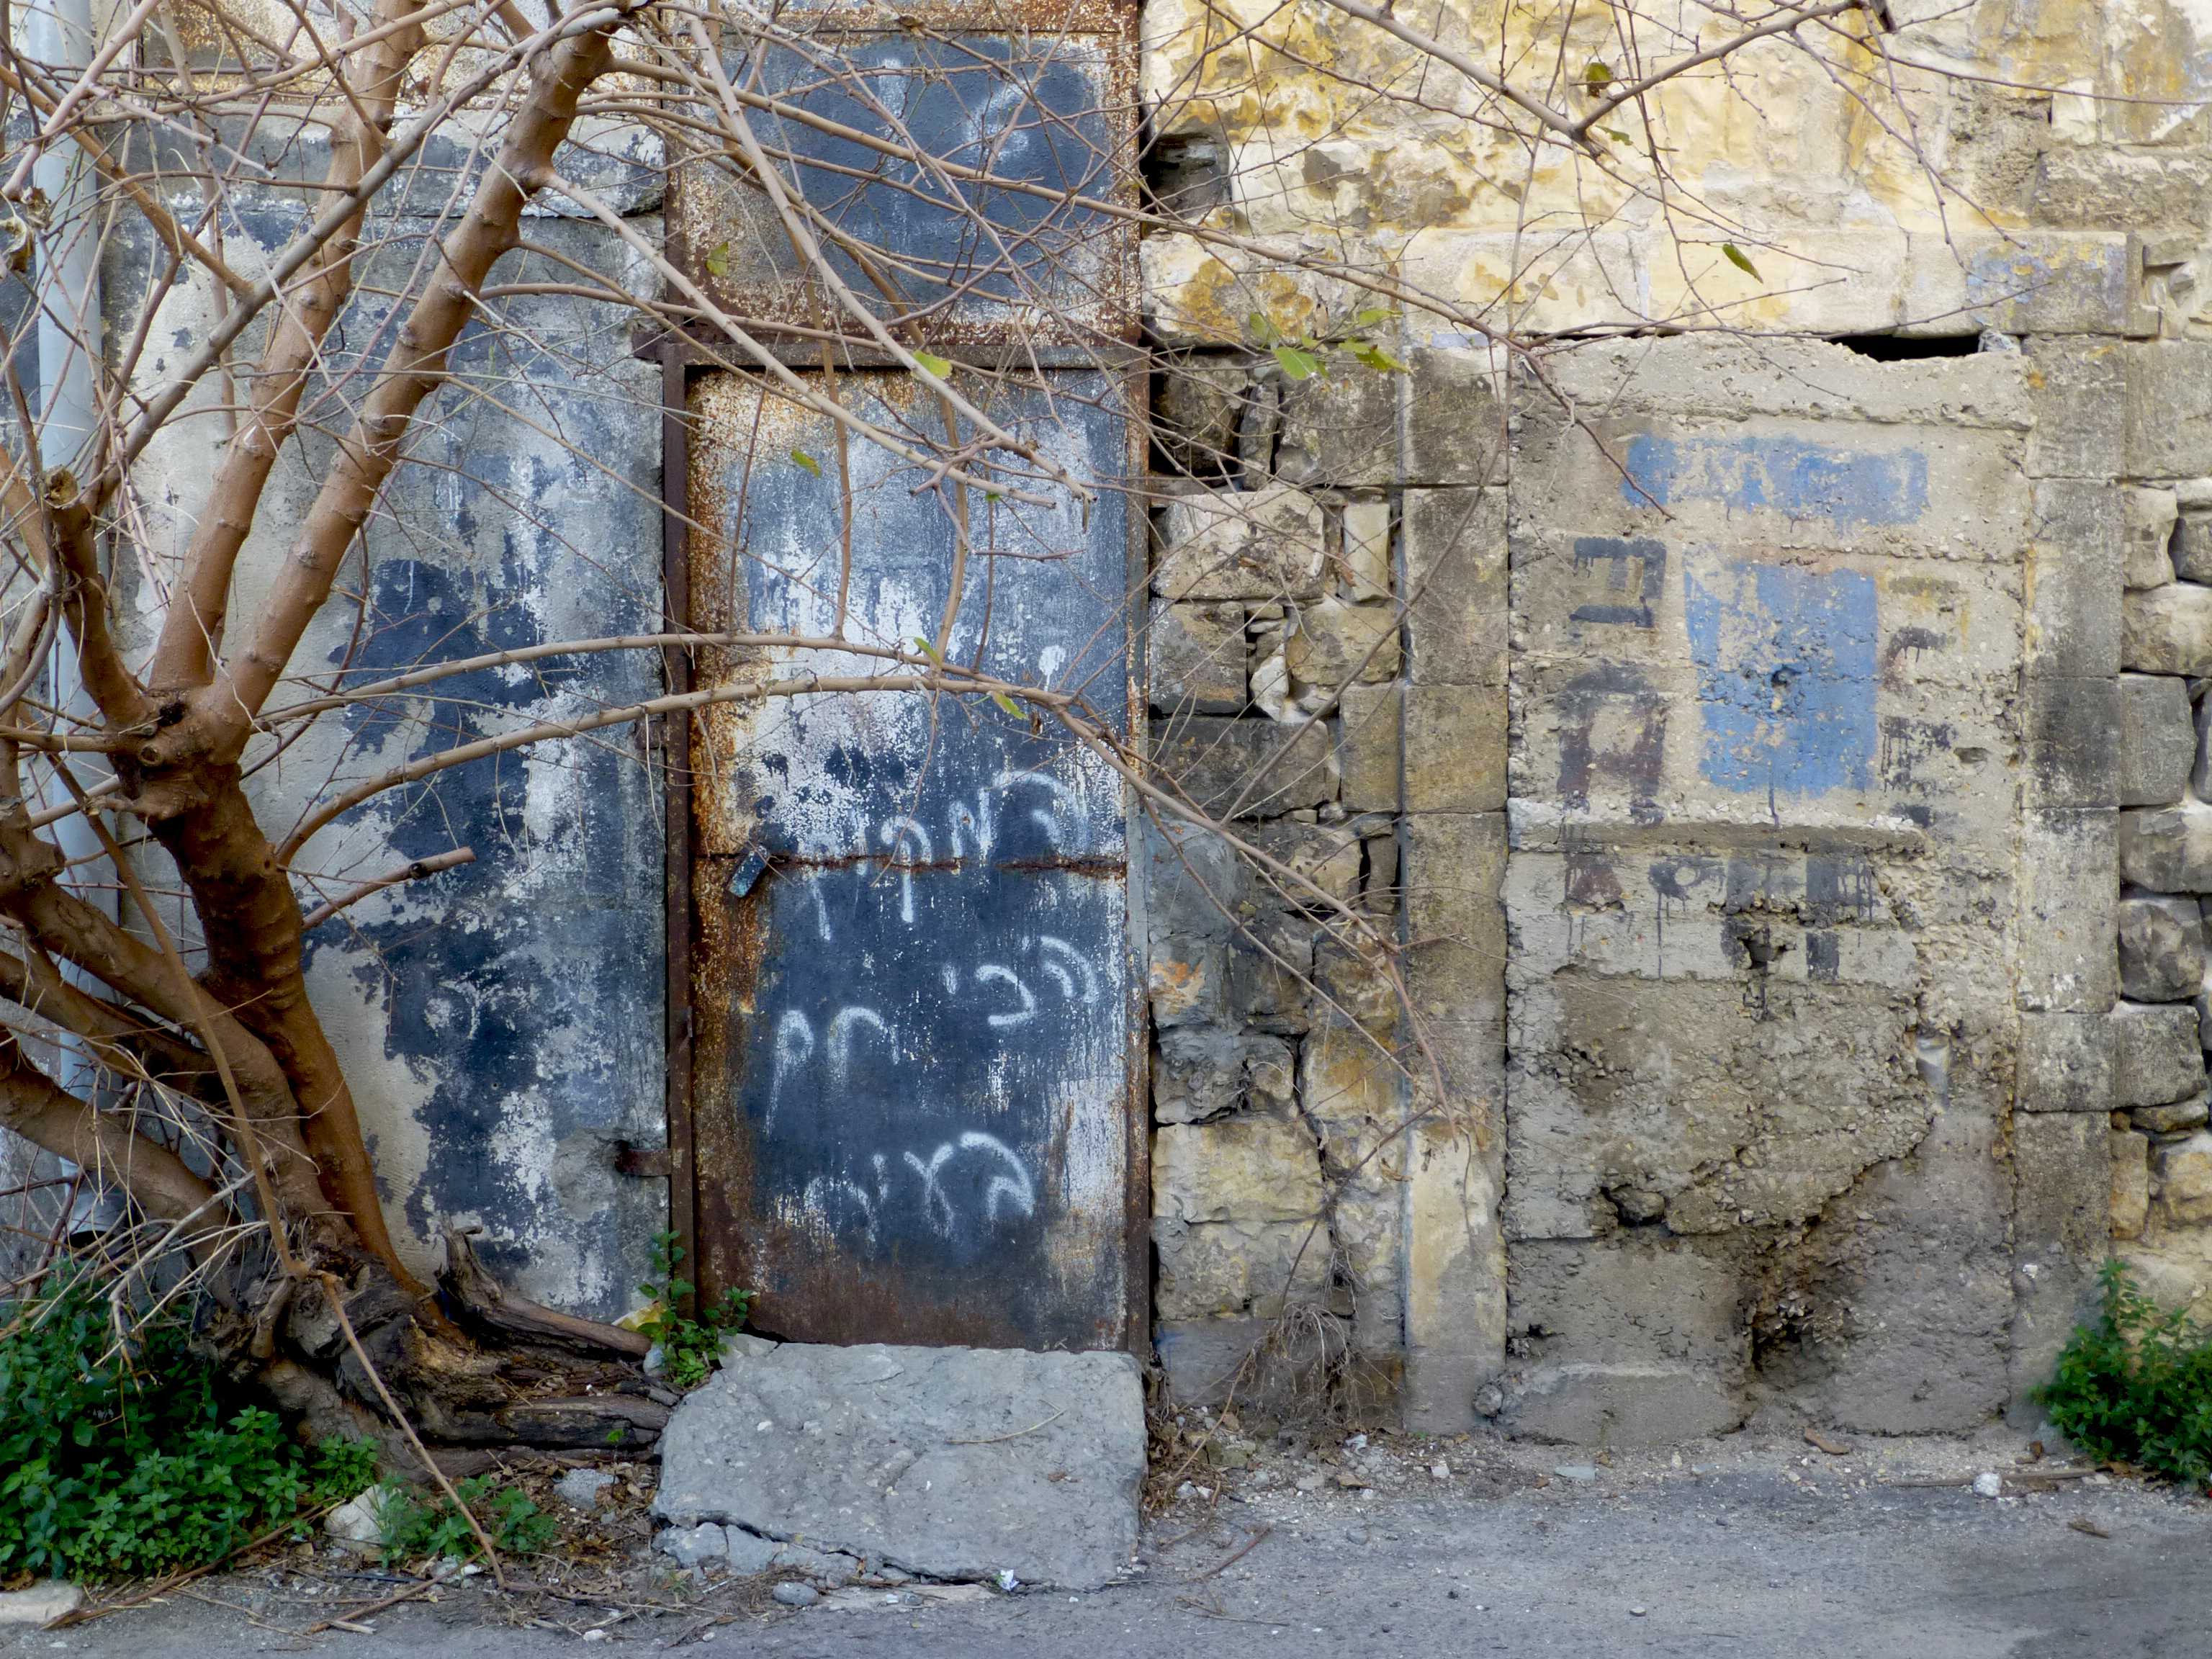 HAIFA | FEBRUARY 2016